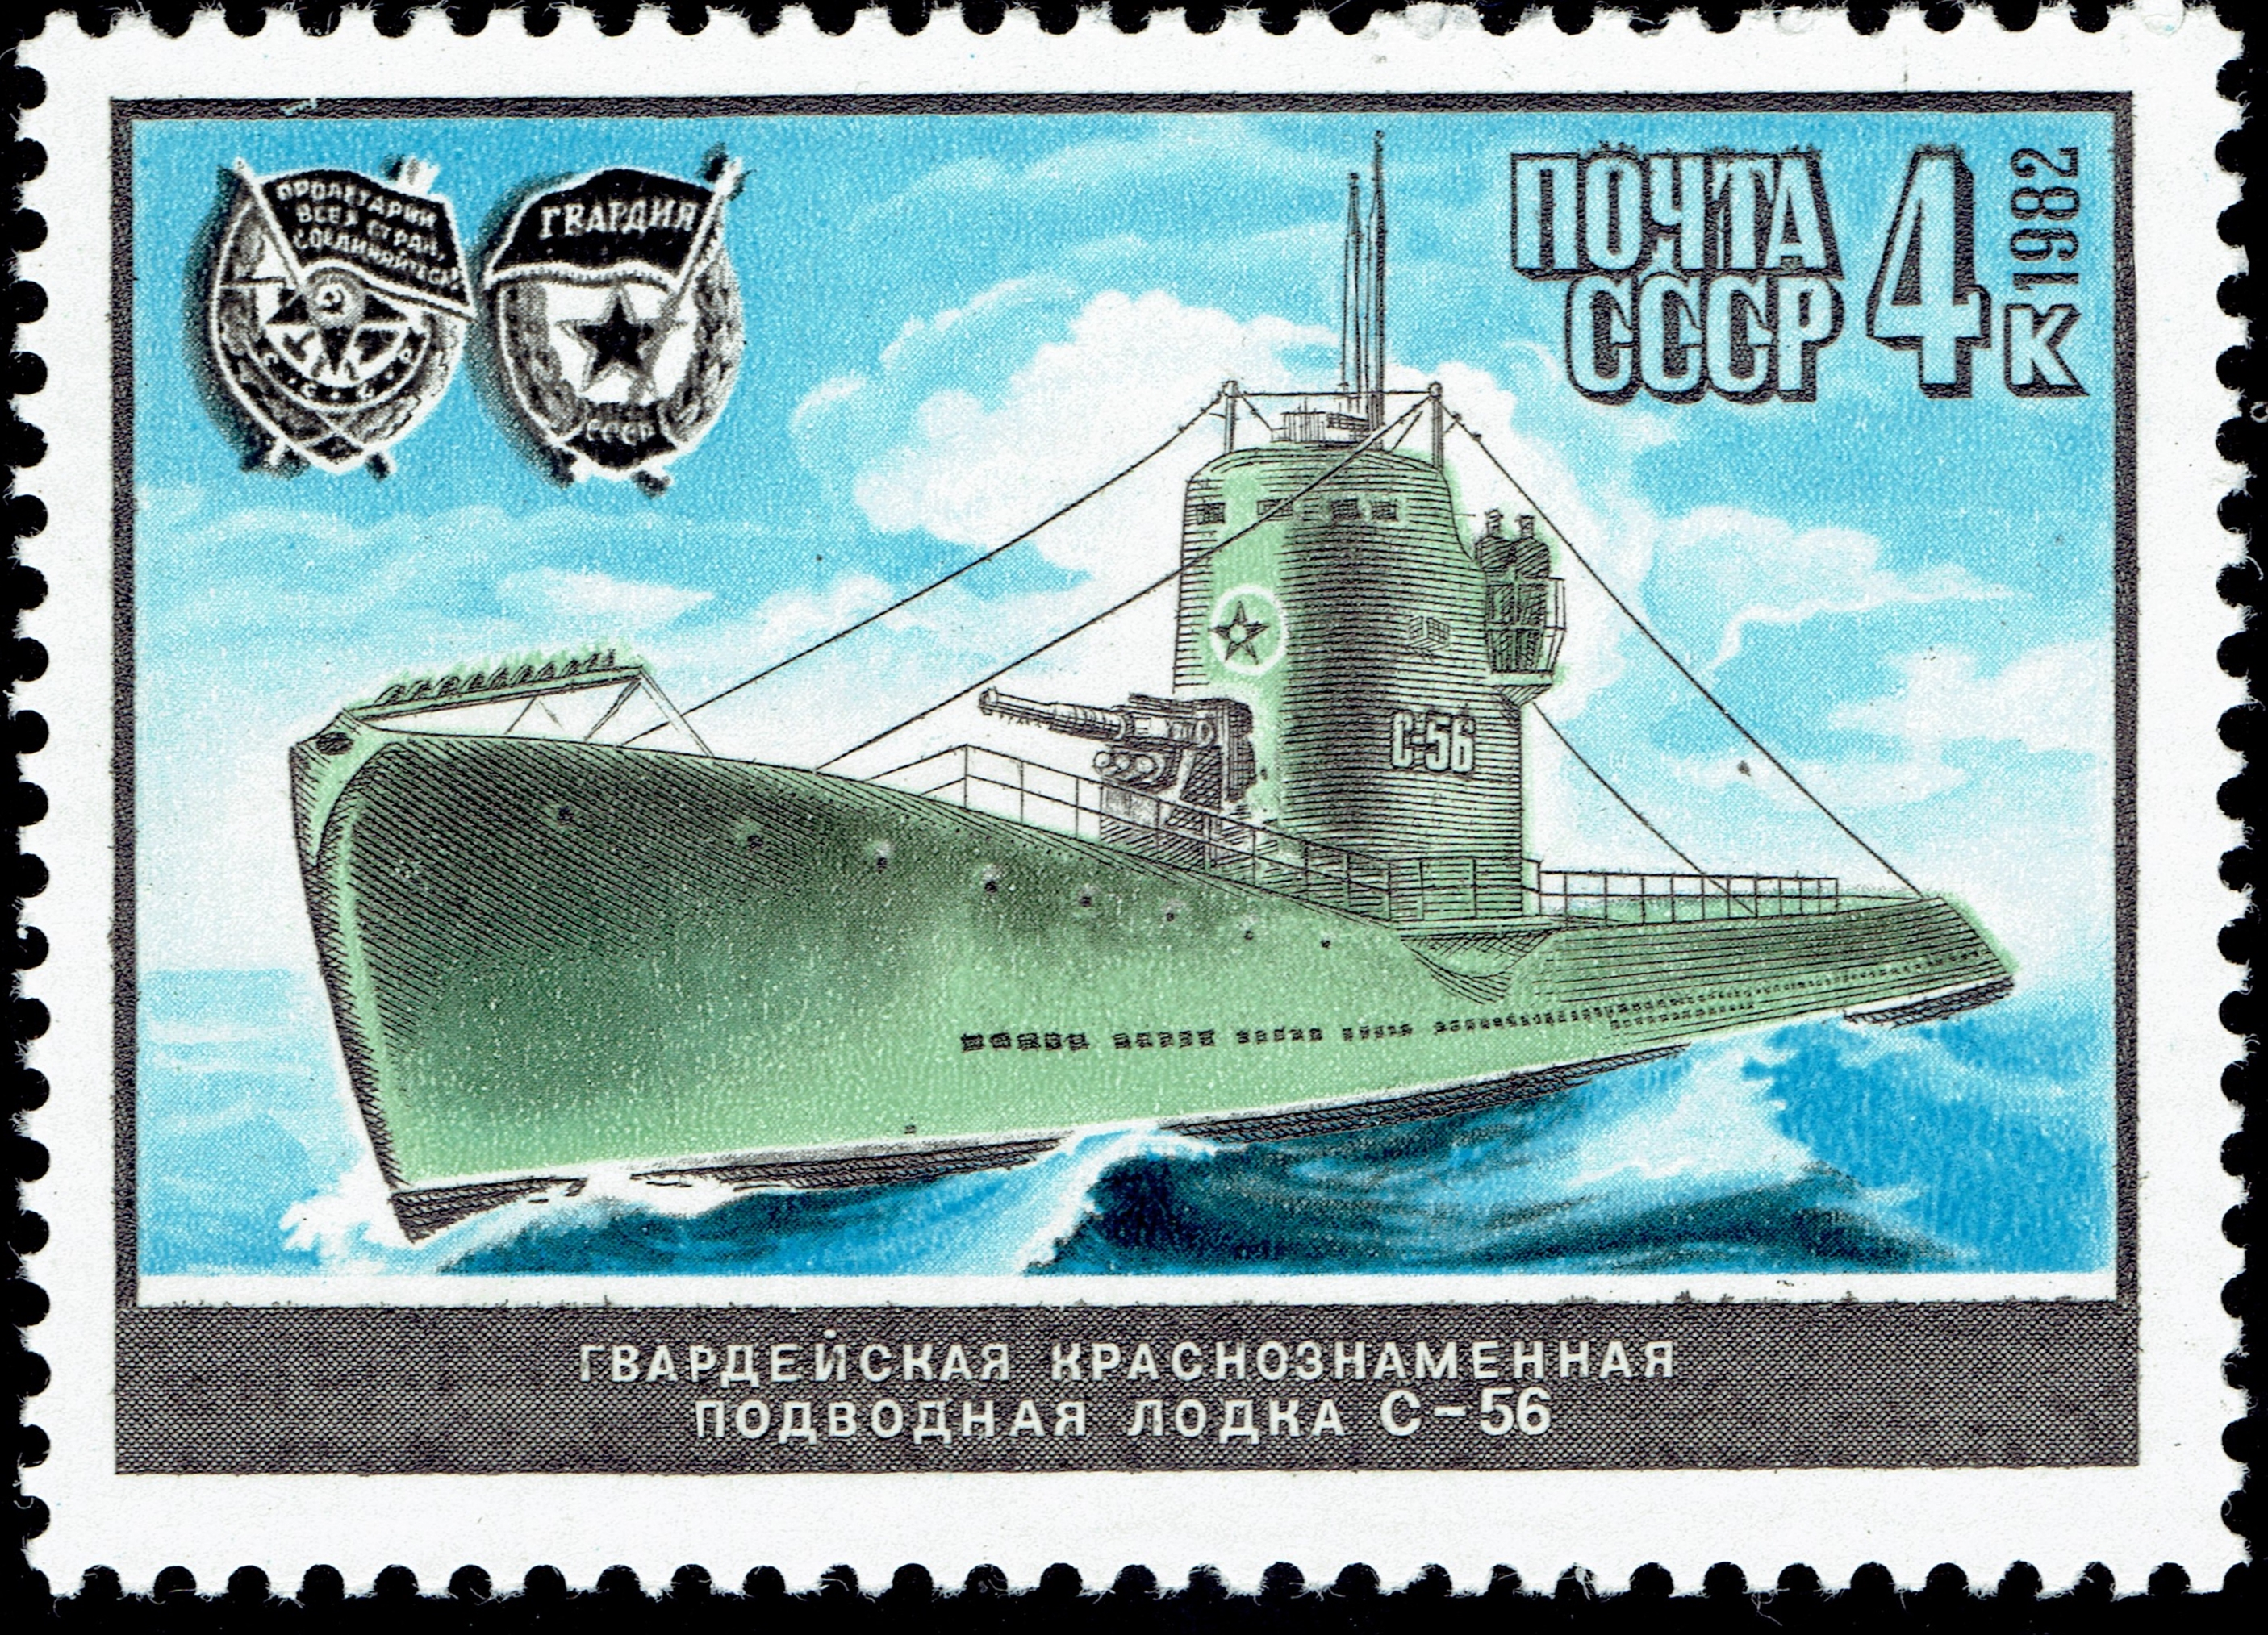 Union of Soviet Socialist Republics - Scott #5085 (1982)